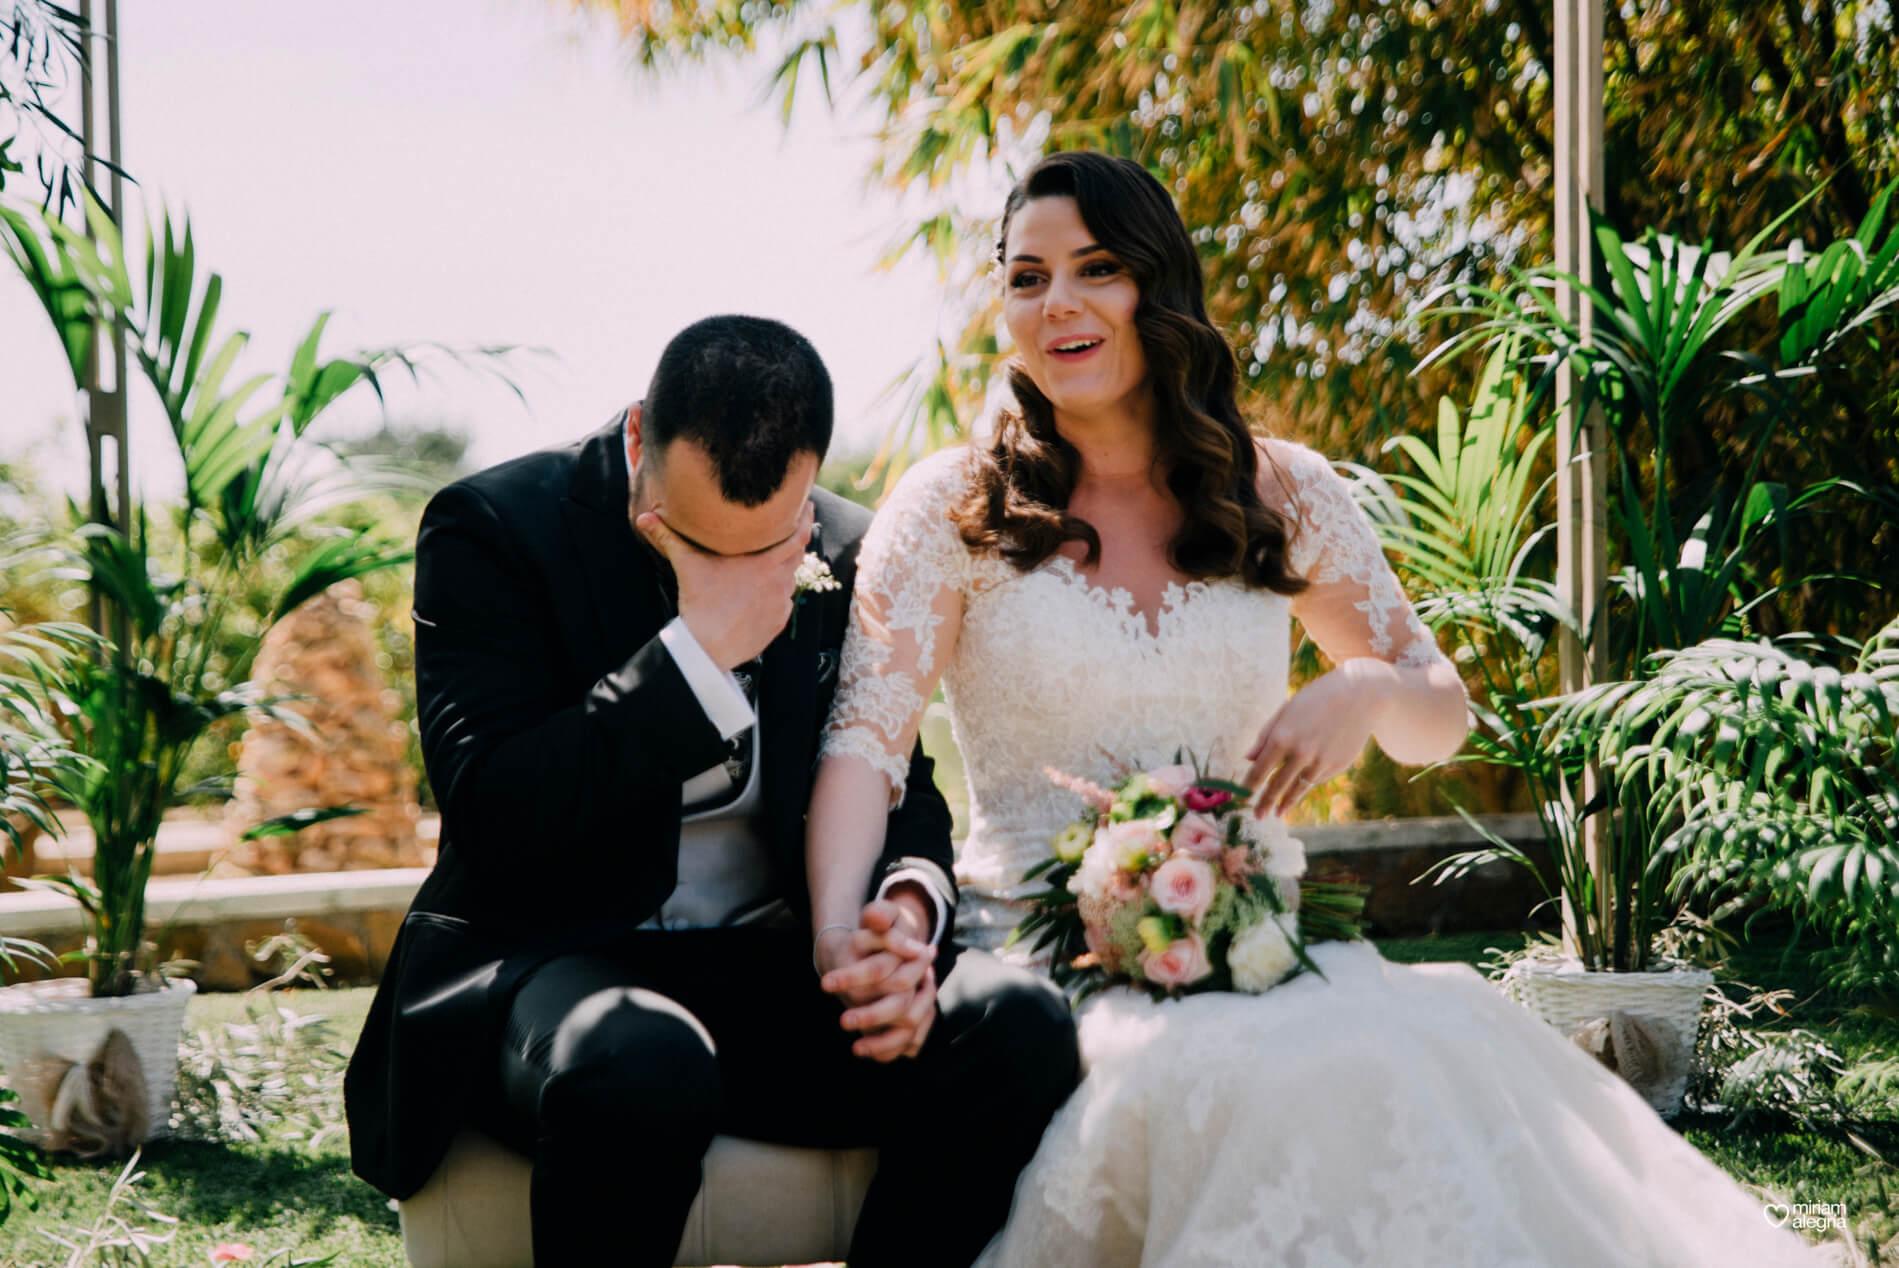 boda-en-finca-jurosa-miriam-alegria-58